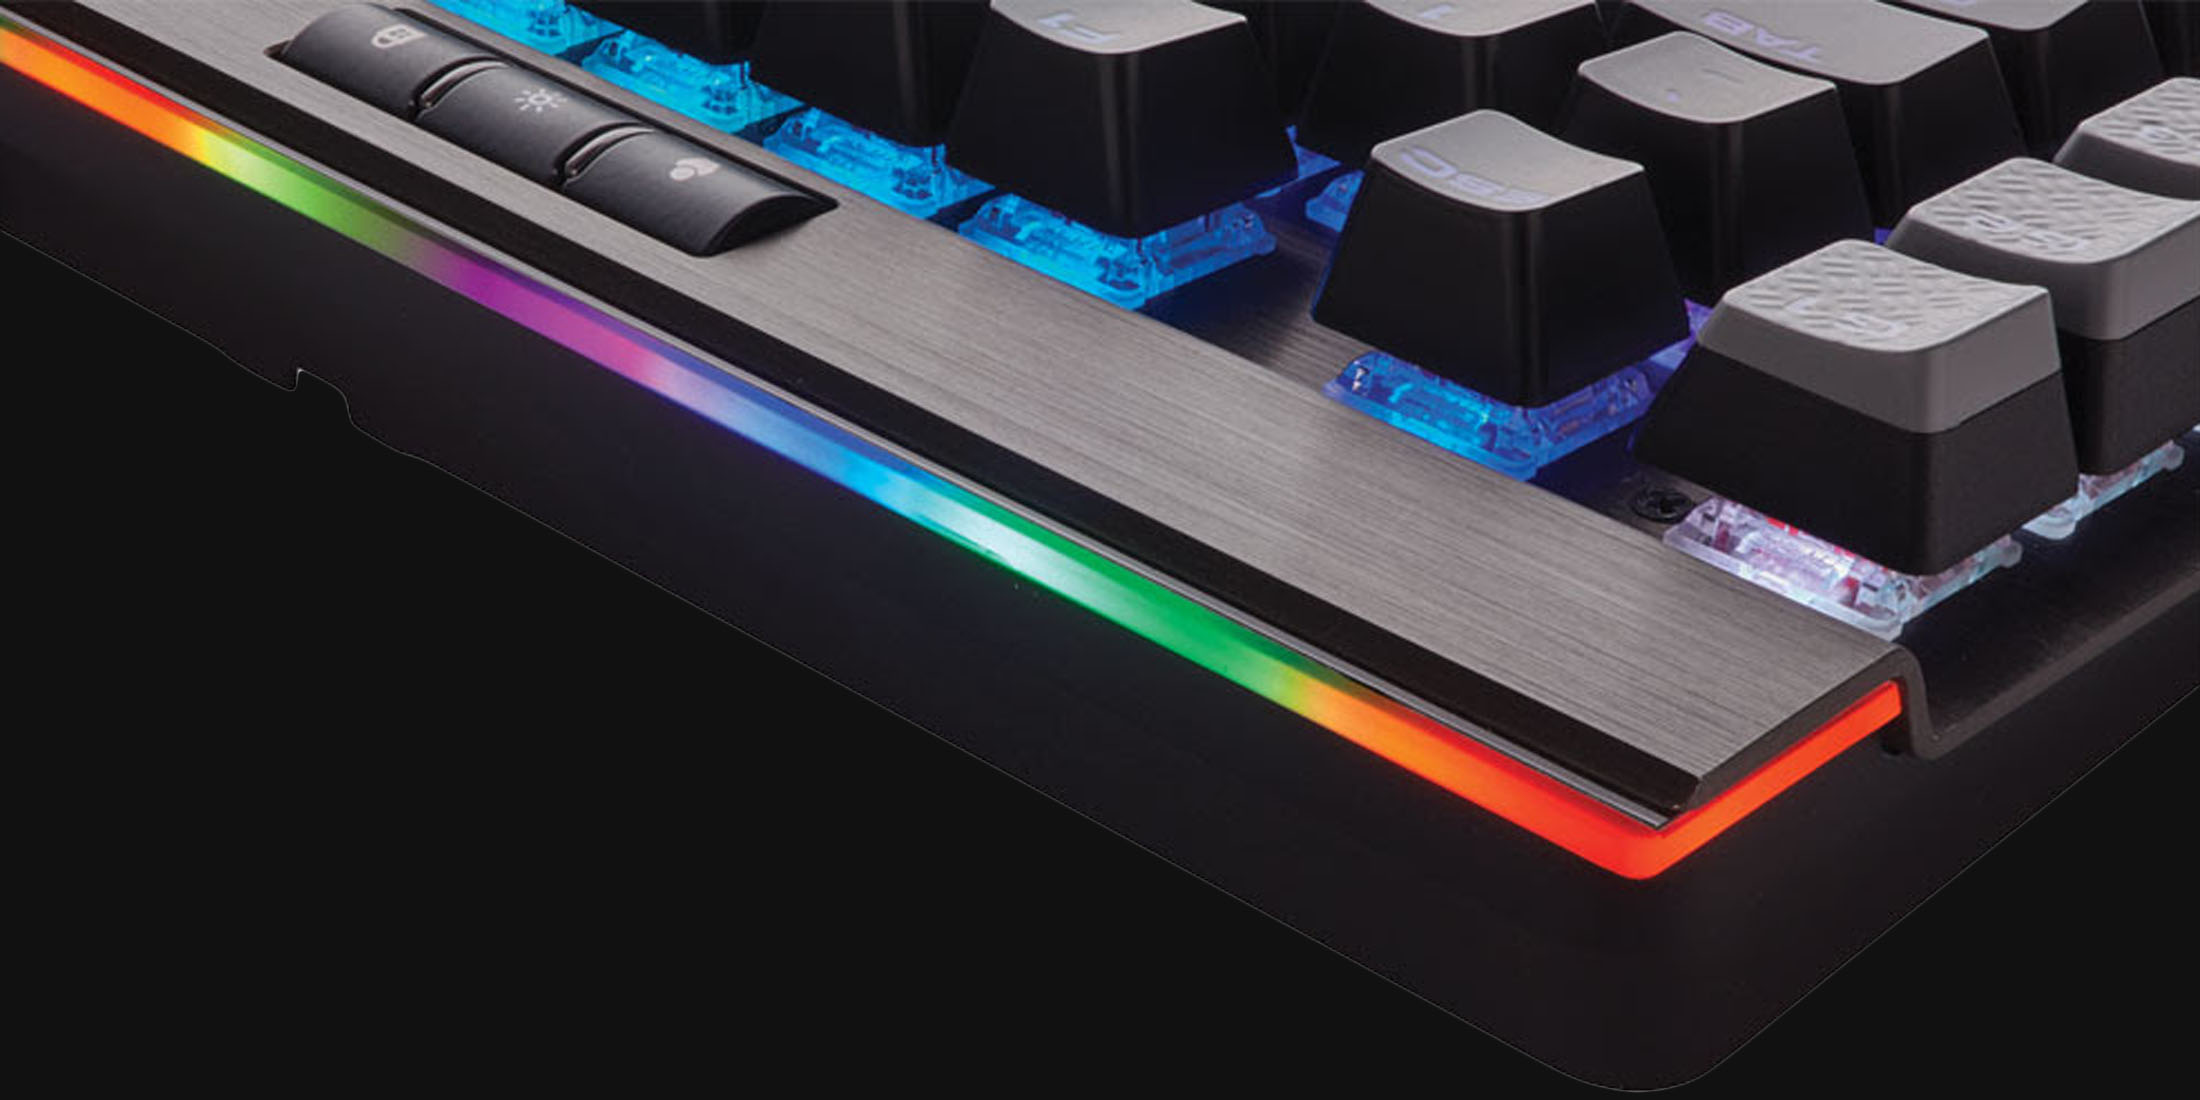 Corsair RGB RAM, Scimitar Pro, K95 Platinum Keyboard